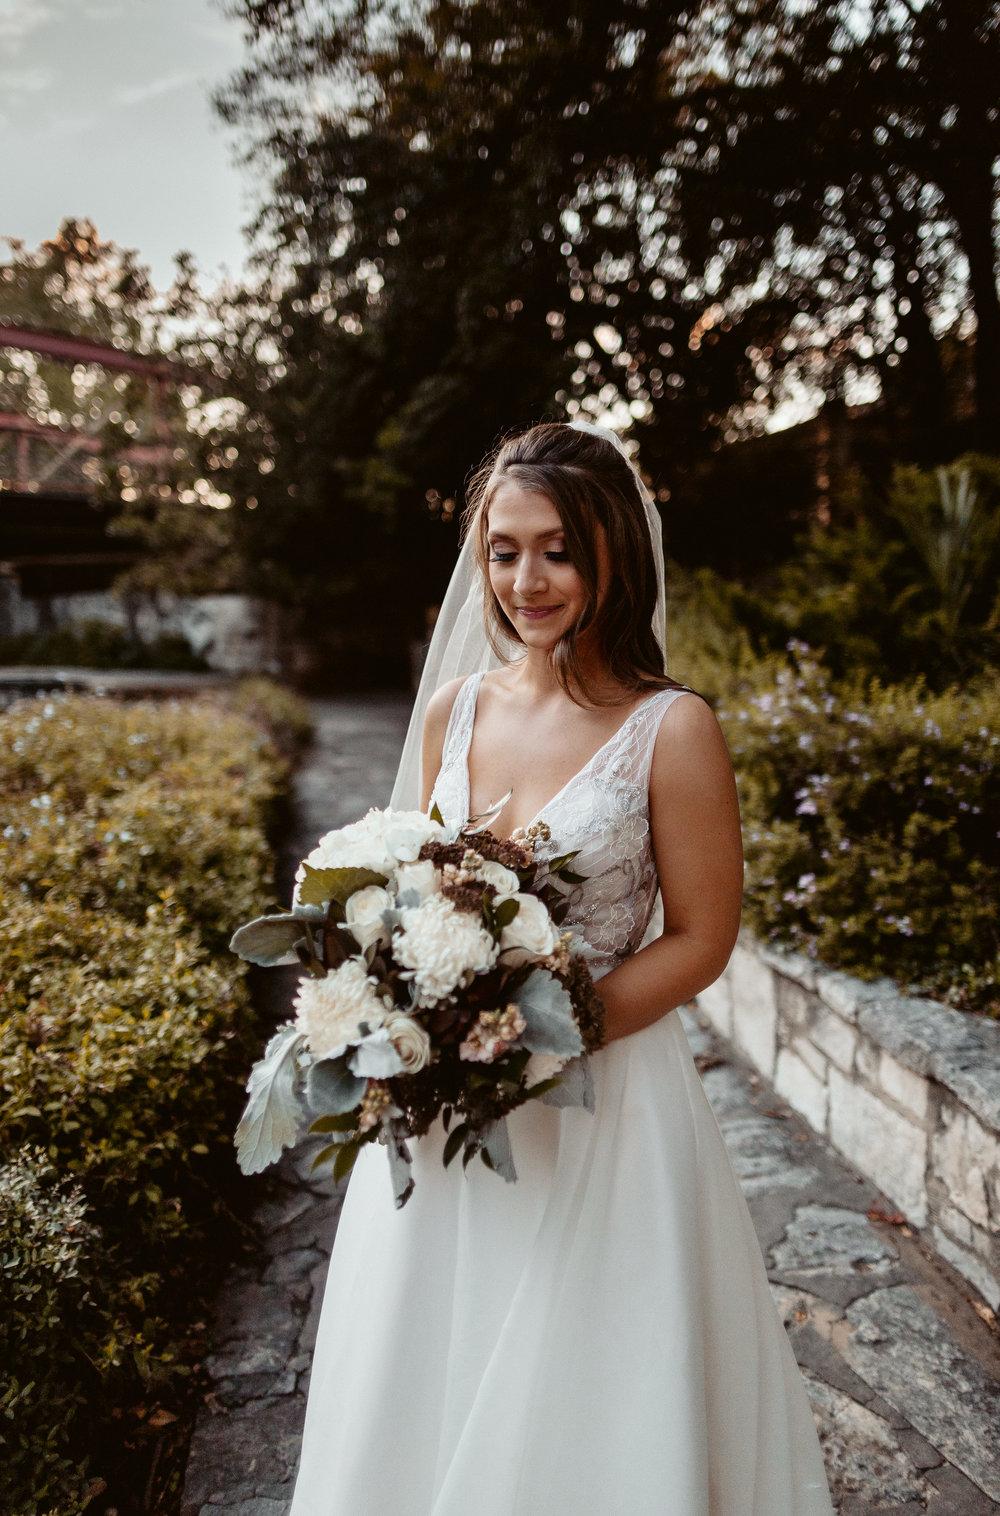 emily-michael-fullwedding-564.jpg